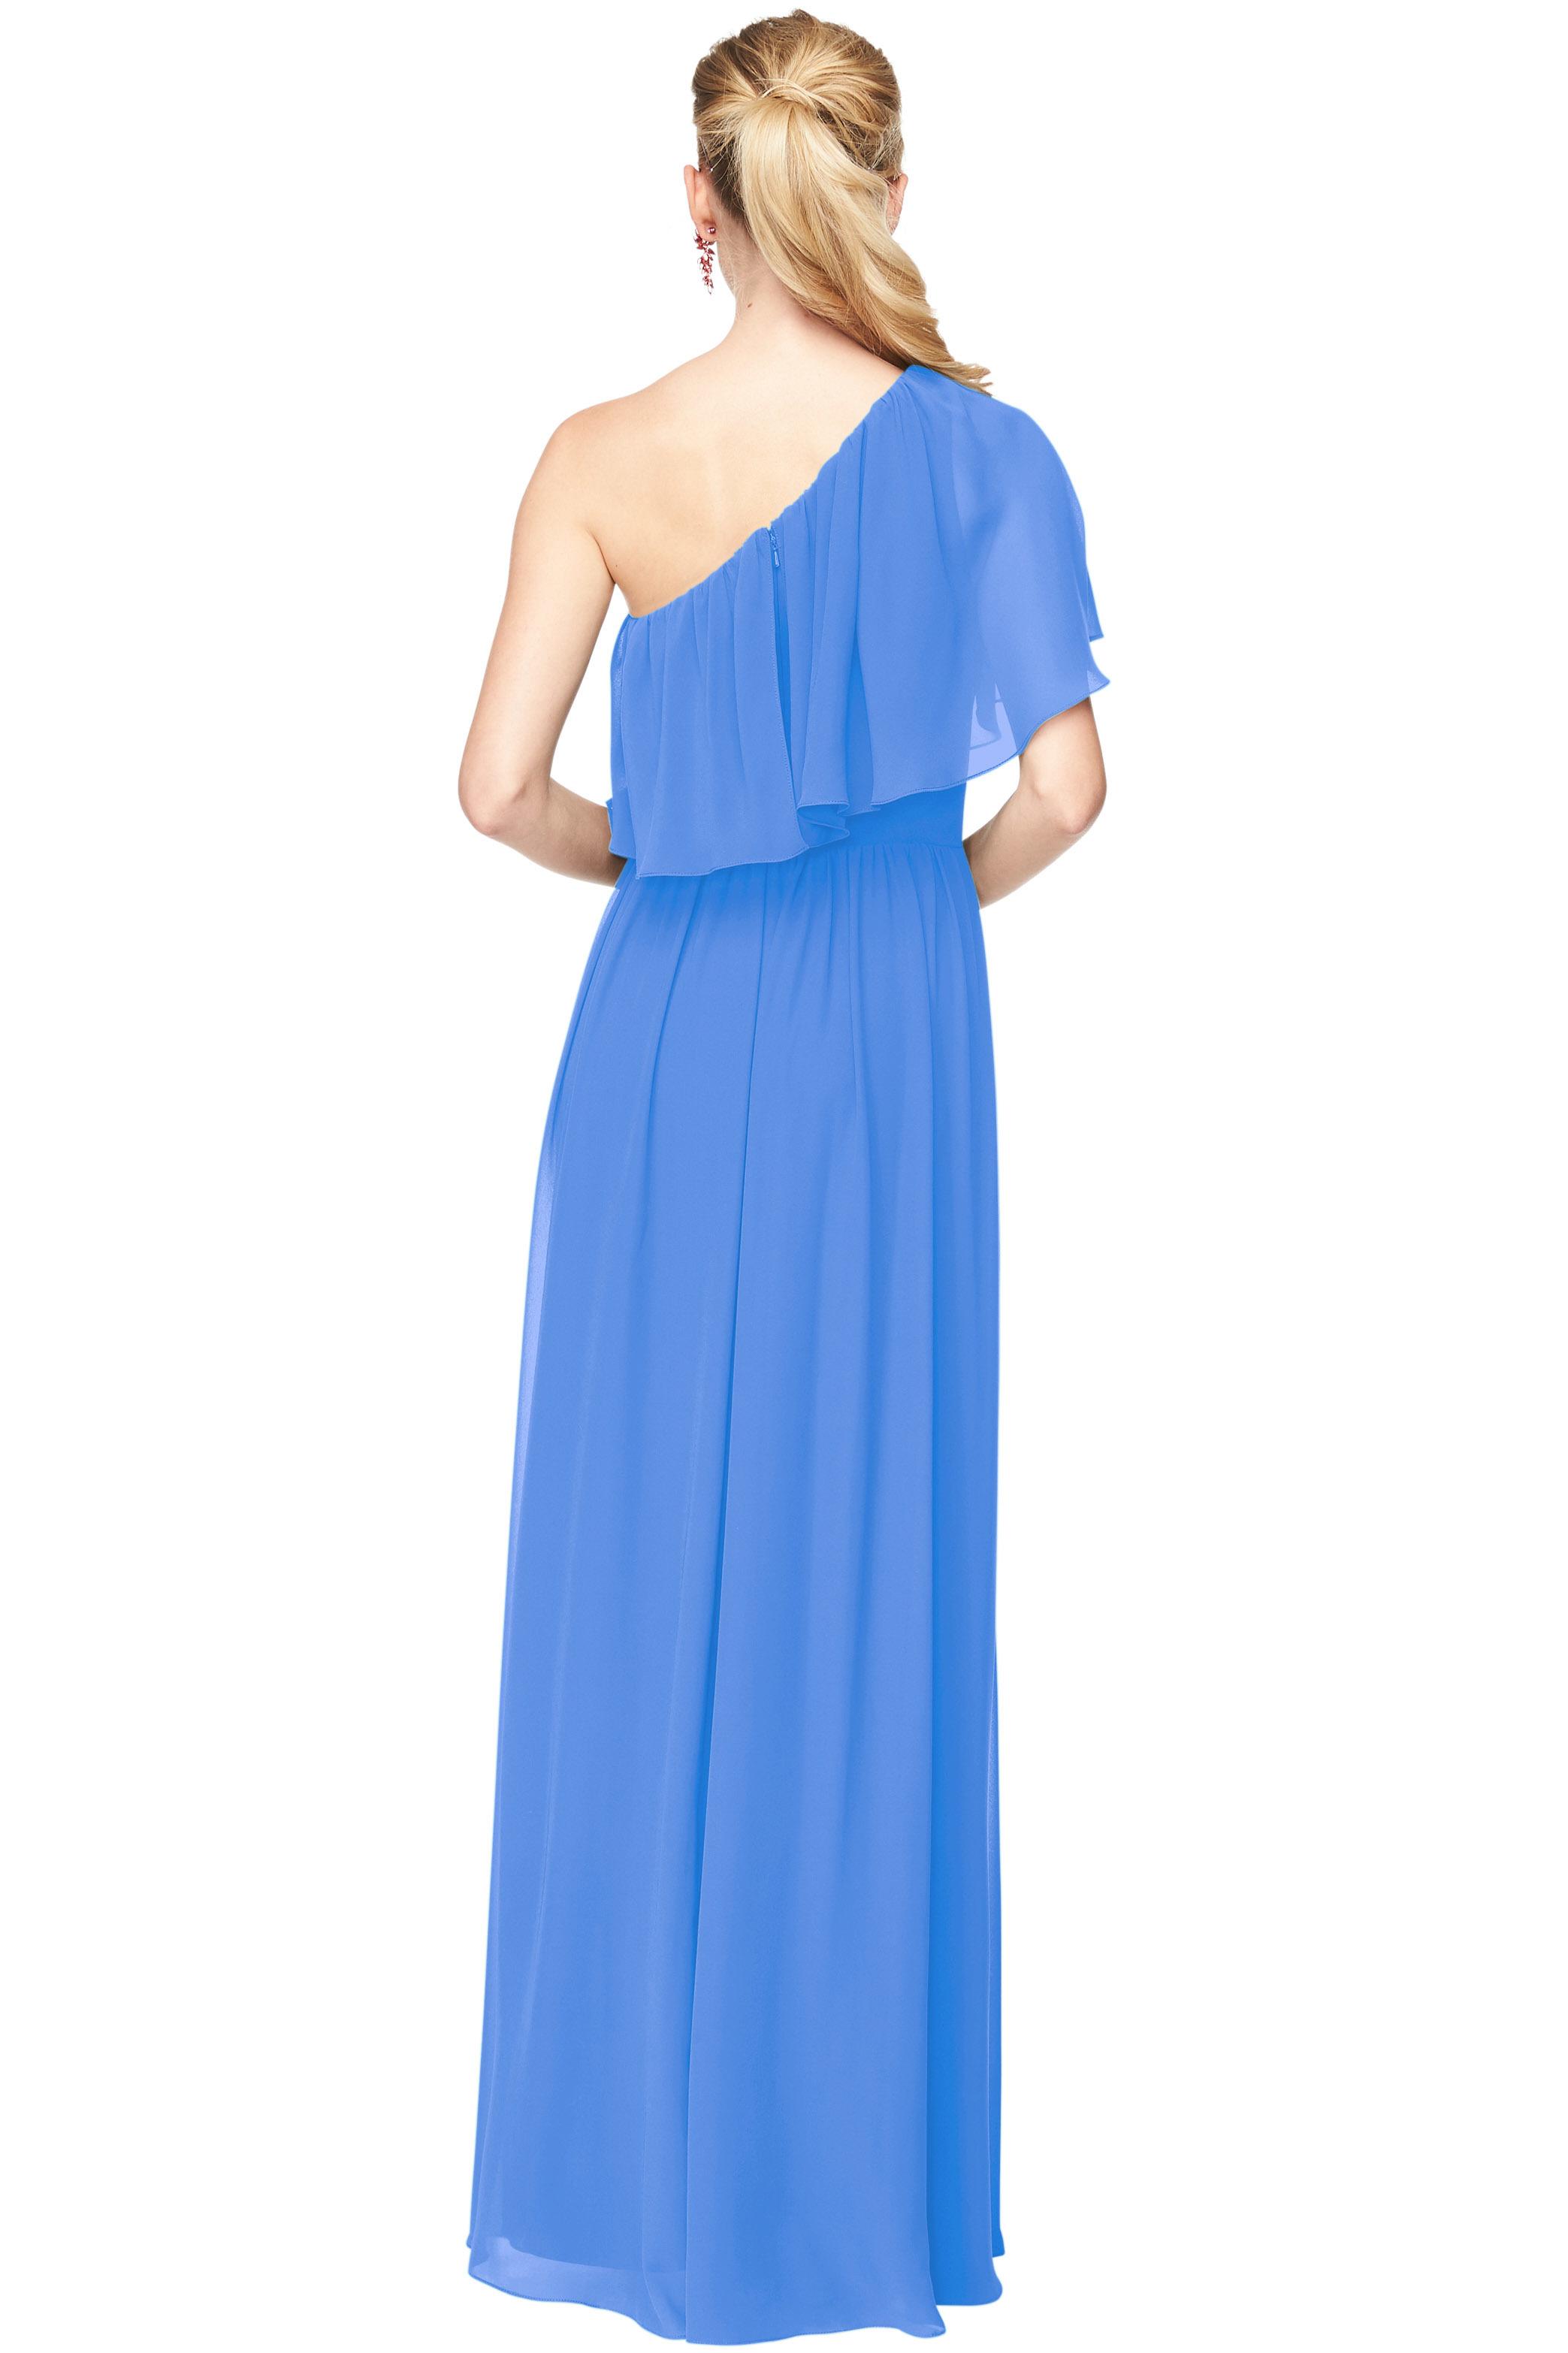 Bill Levkoff CORNFLOWER Chiffon One Shoulder A-Line gown, $184.00 Back